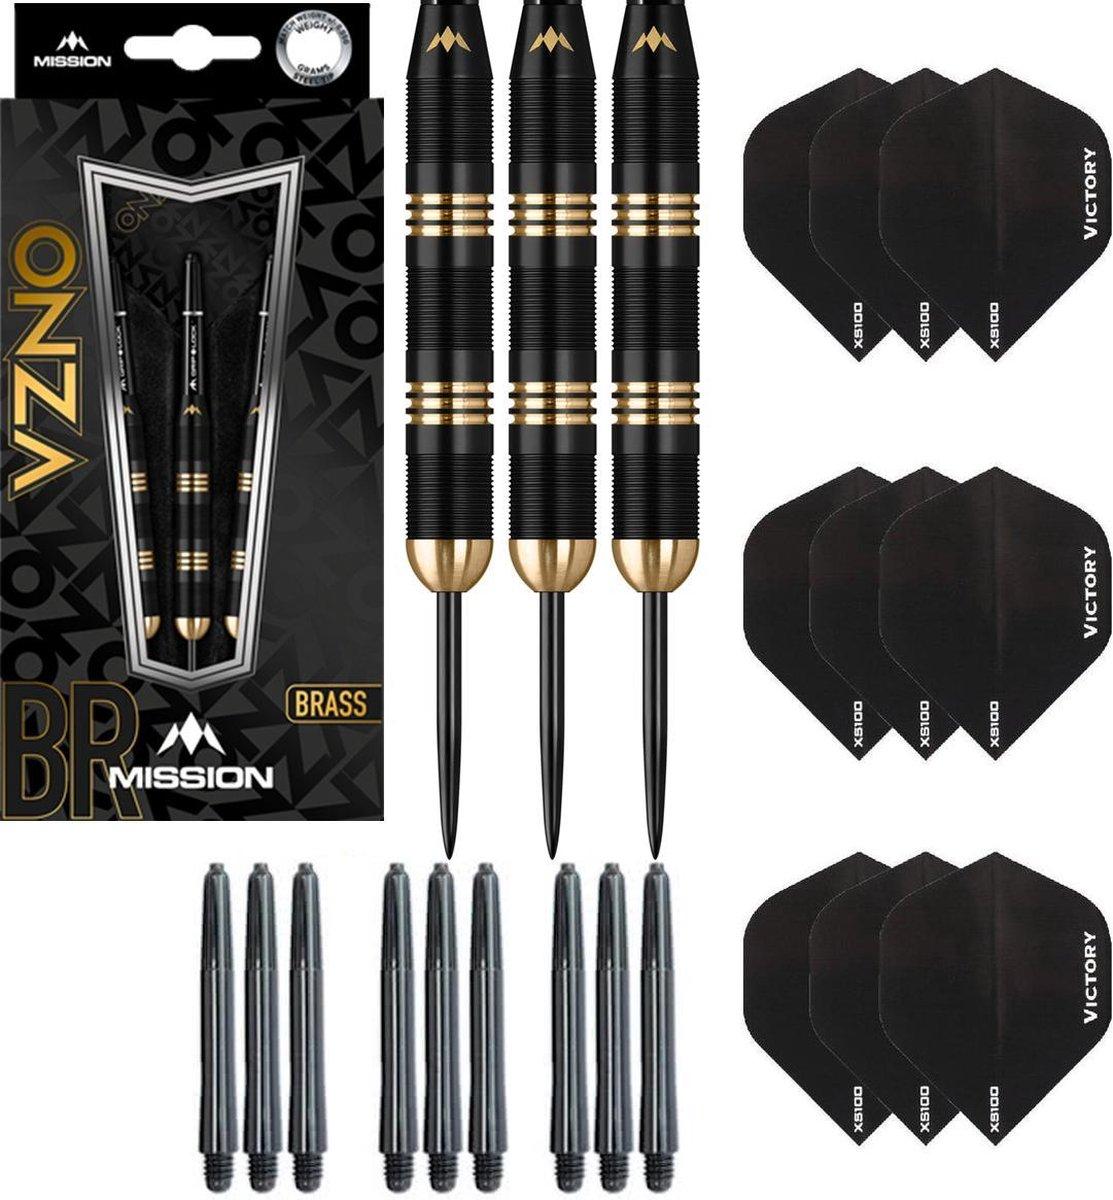 Dragon Darts Onza 100% brass - dartpijlen - 24 gram - inclusief 9 - darts shafts - en 9 - darts flights